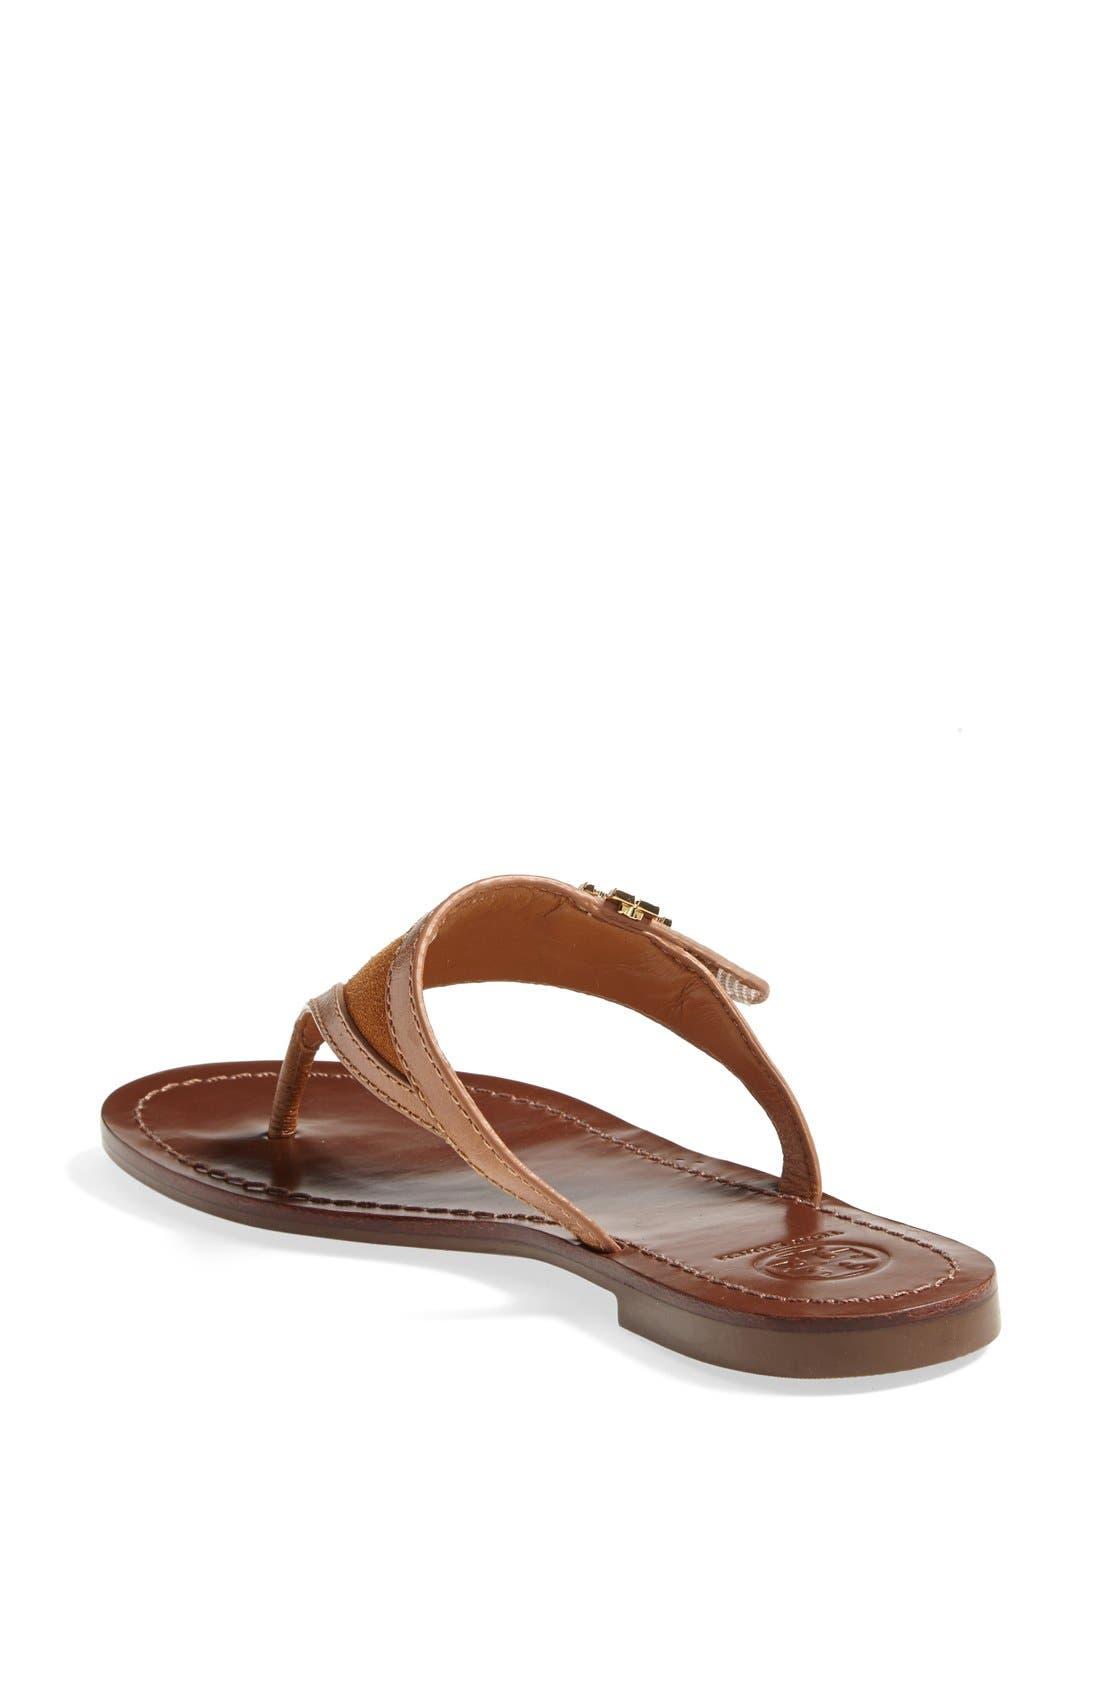 Alternate Image 2  - Tory Burch 'Eloise' Flat Thong Sandal (Nordstrom Exclusive) (Women)